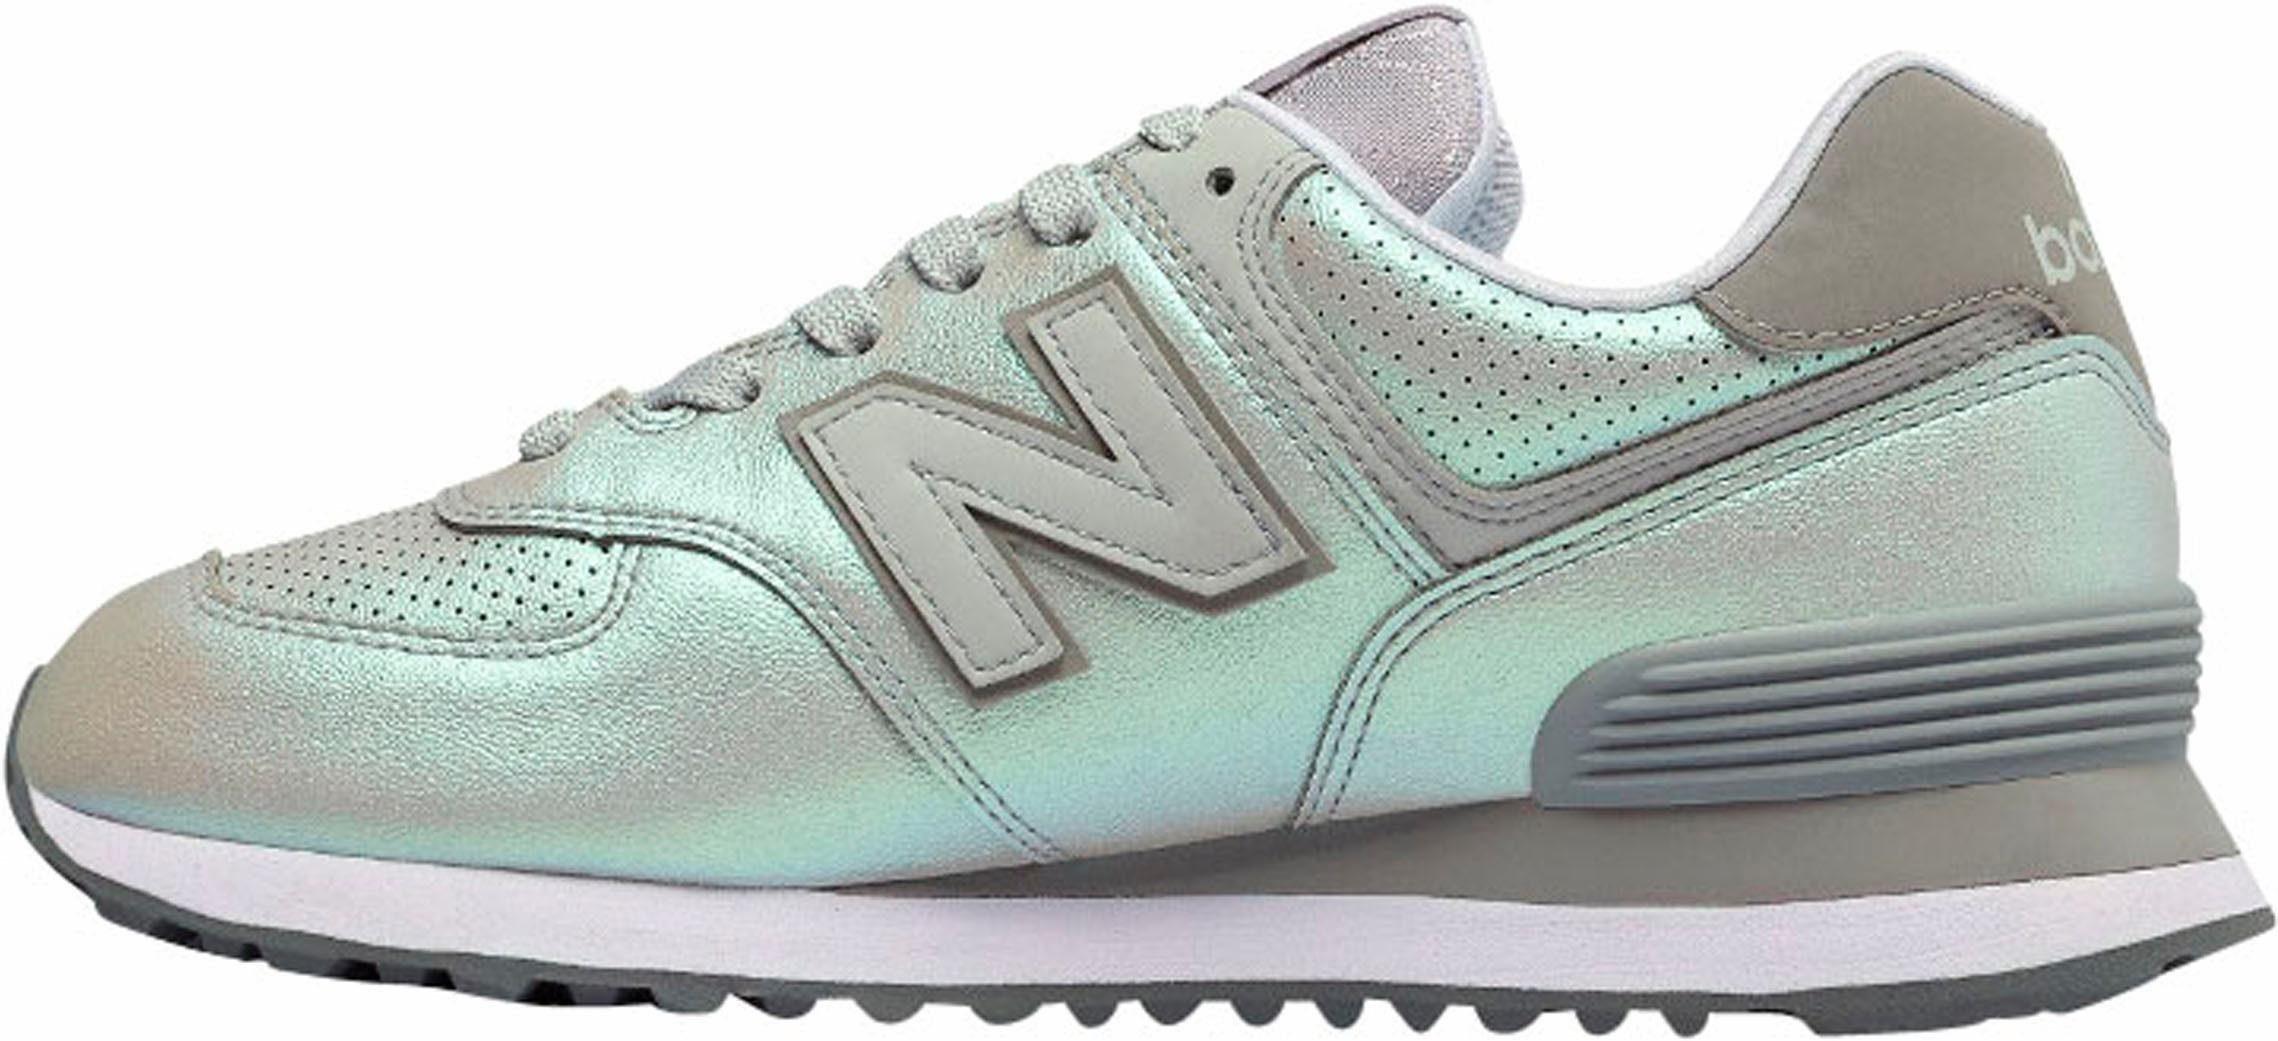 New Balance »WL 574« Sneaker, Obermaterialmix aus atmungsaktivem Synthetik online kaufen | OTTO